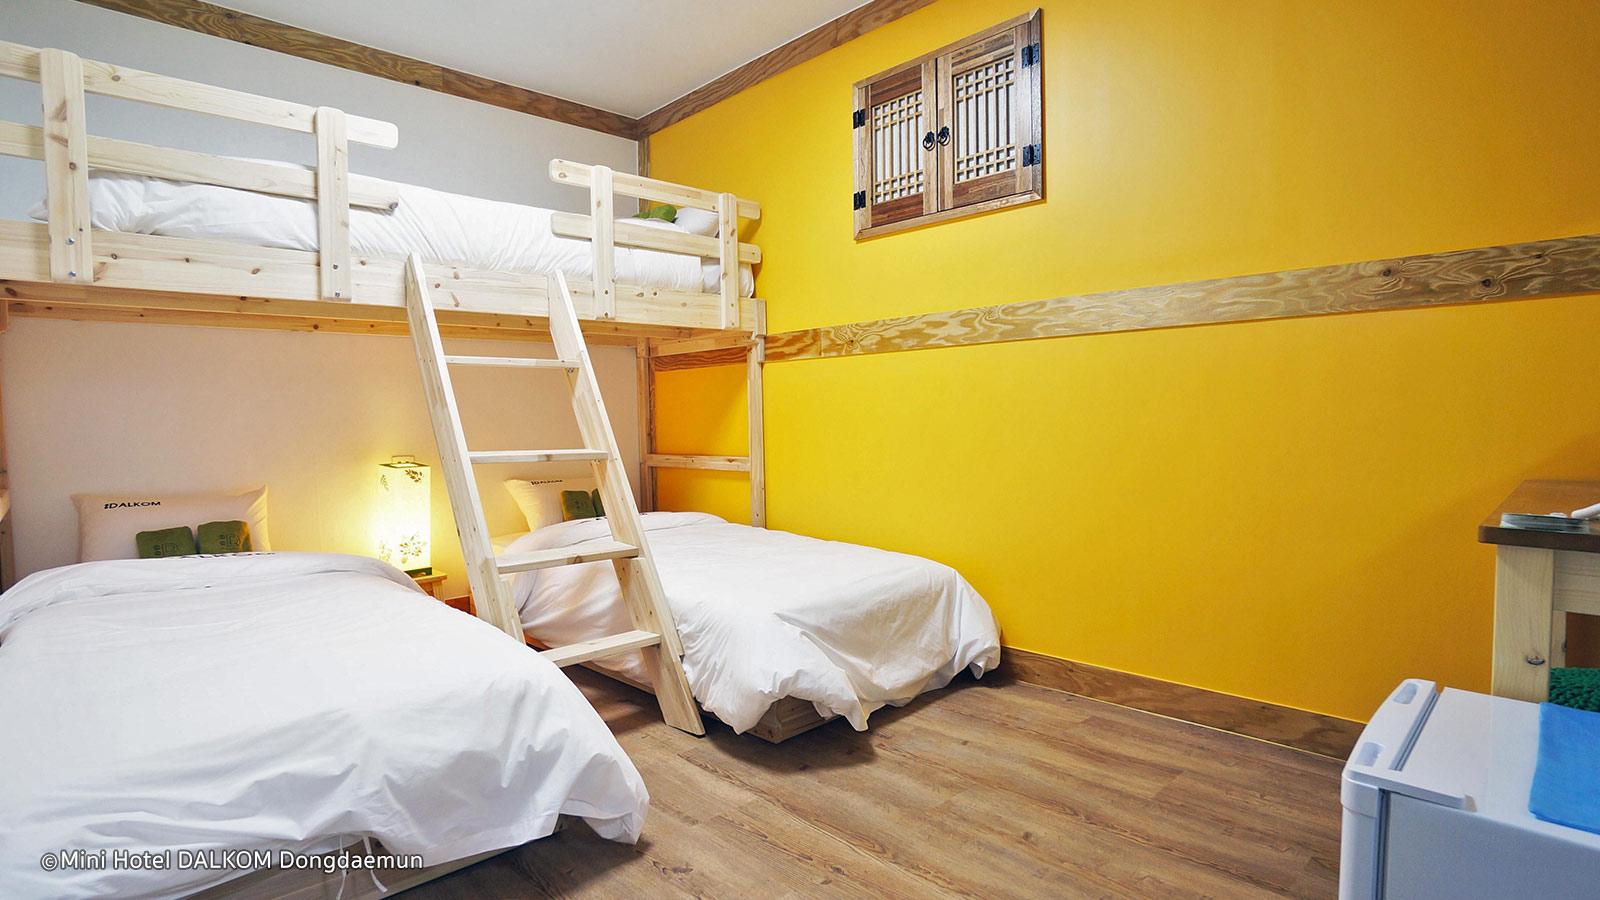 mini-hotel-dalkom-dongdaemun.jpg